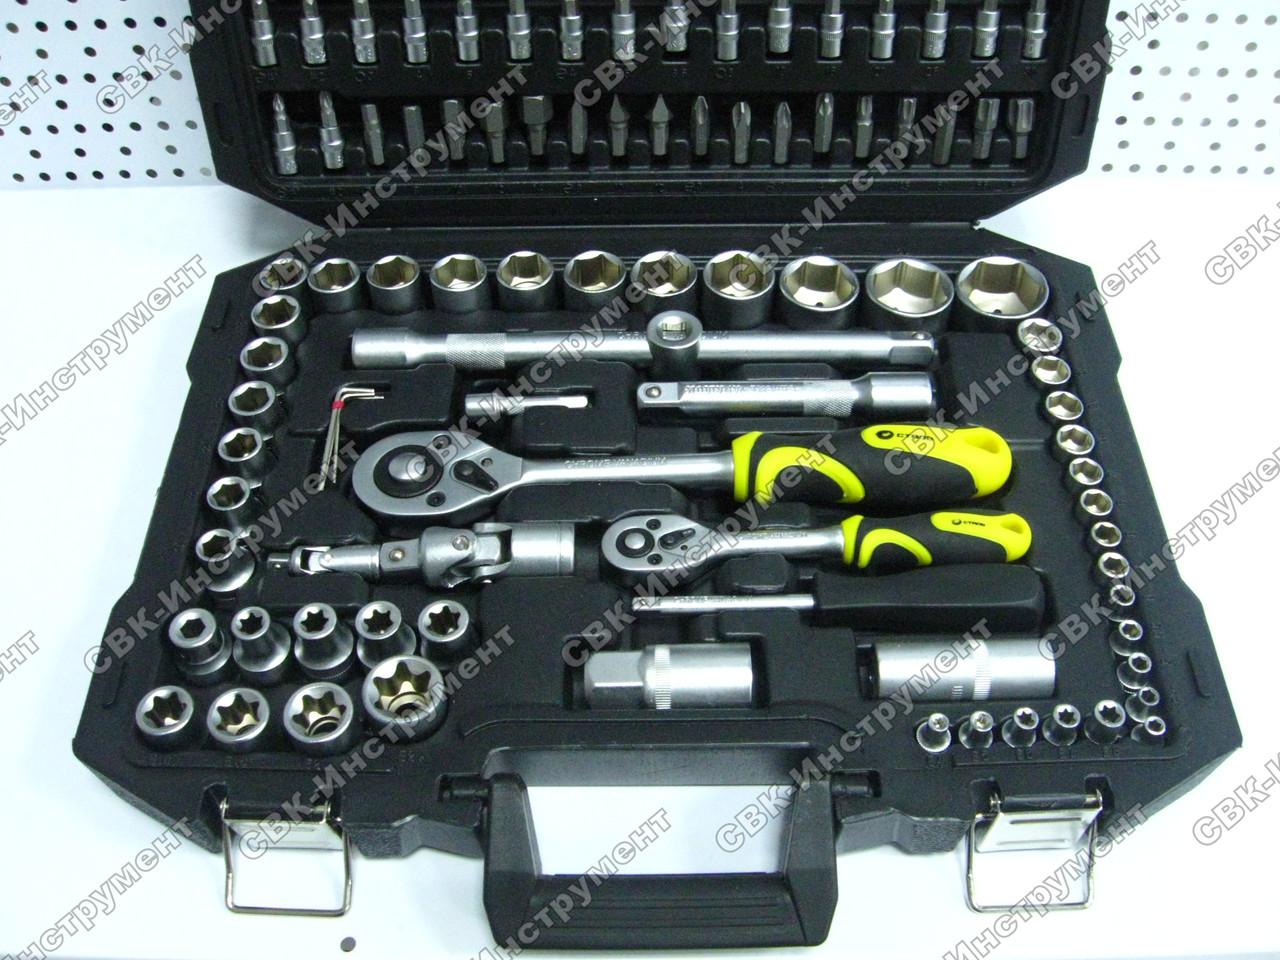 Набір інструментів Сталь 108 одиниць